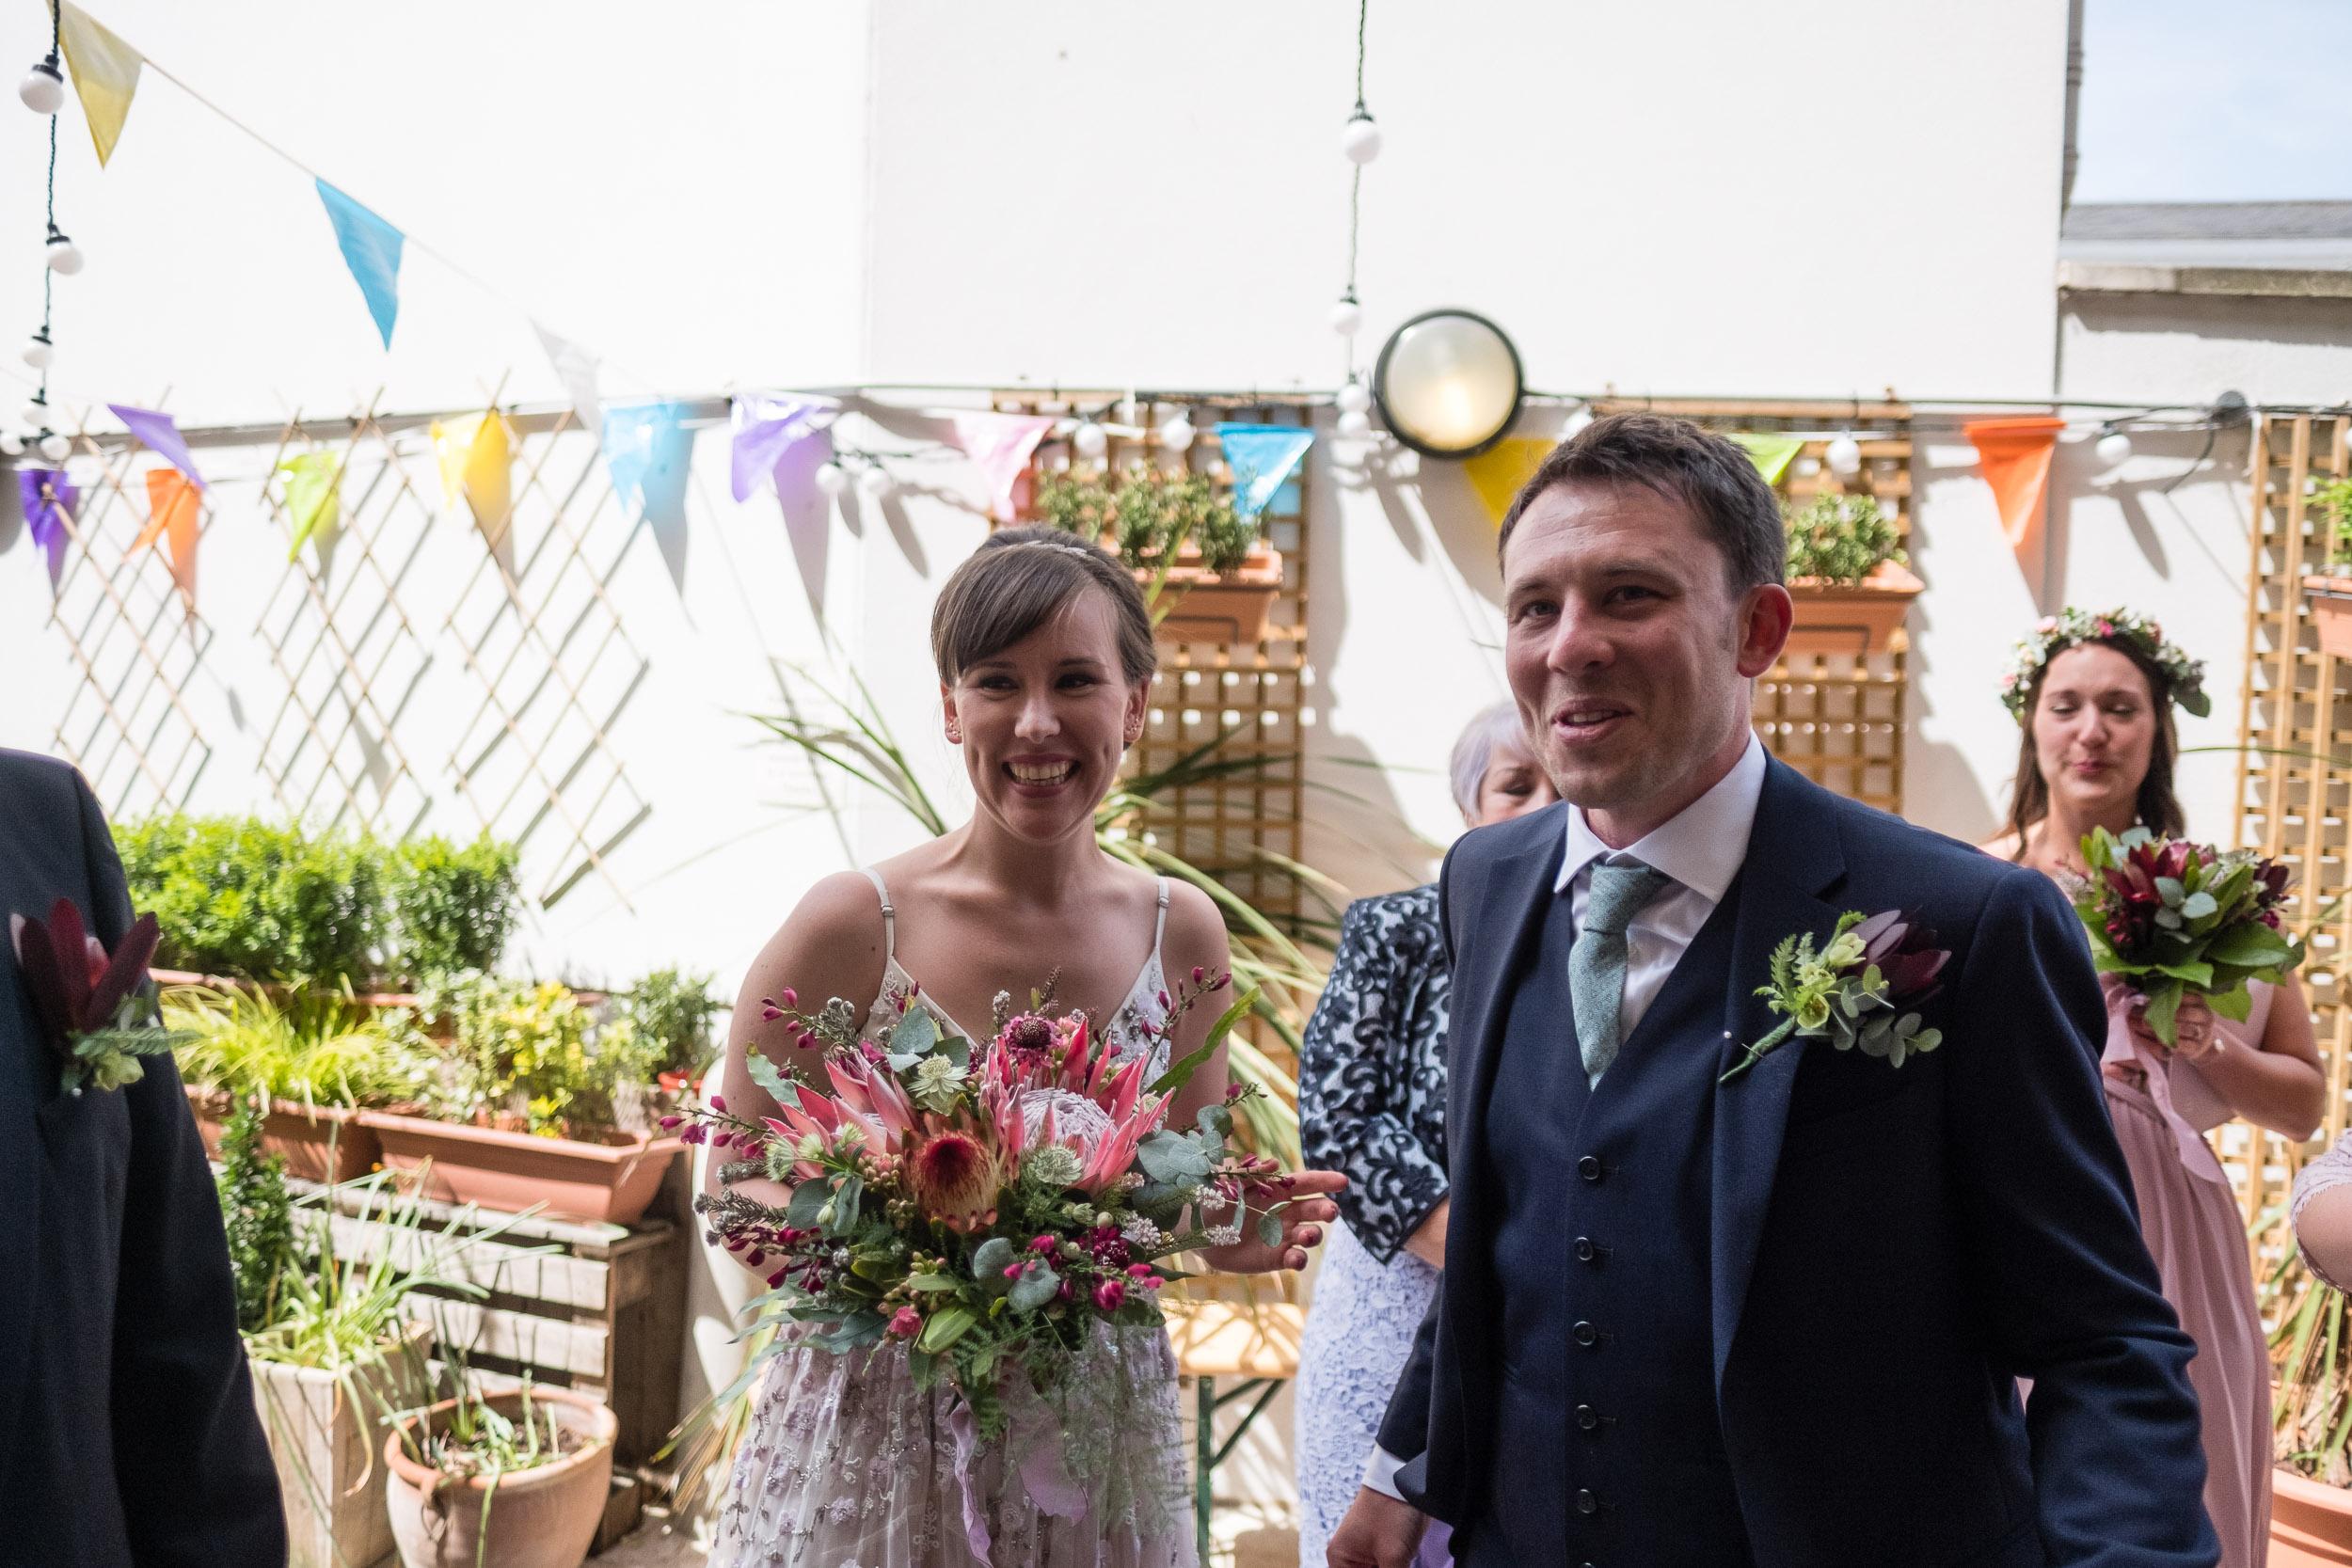 brockwell-lido-brixton-herne-hill-wedding-047.jpg